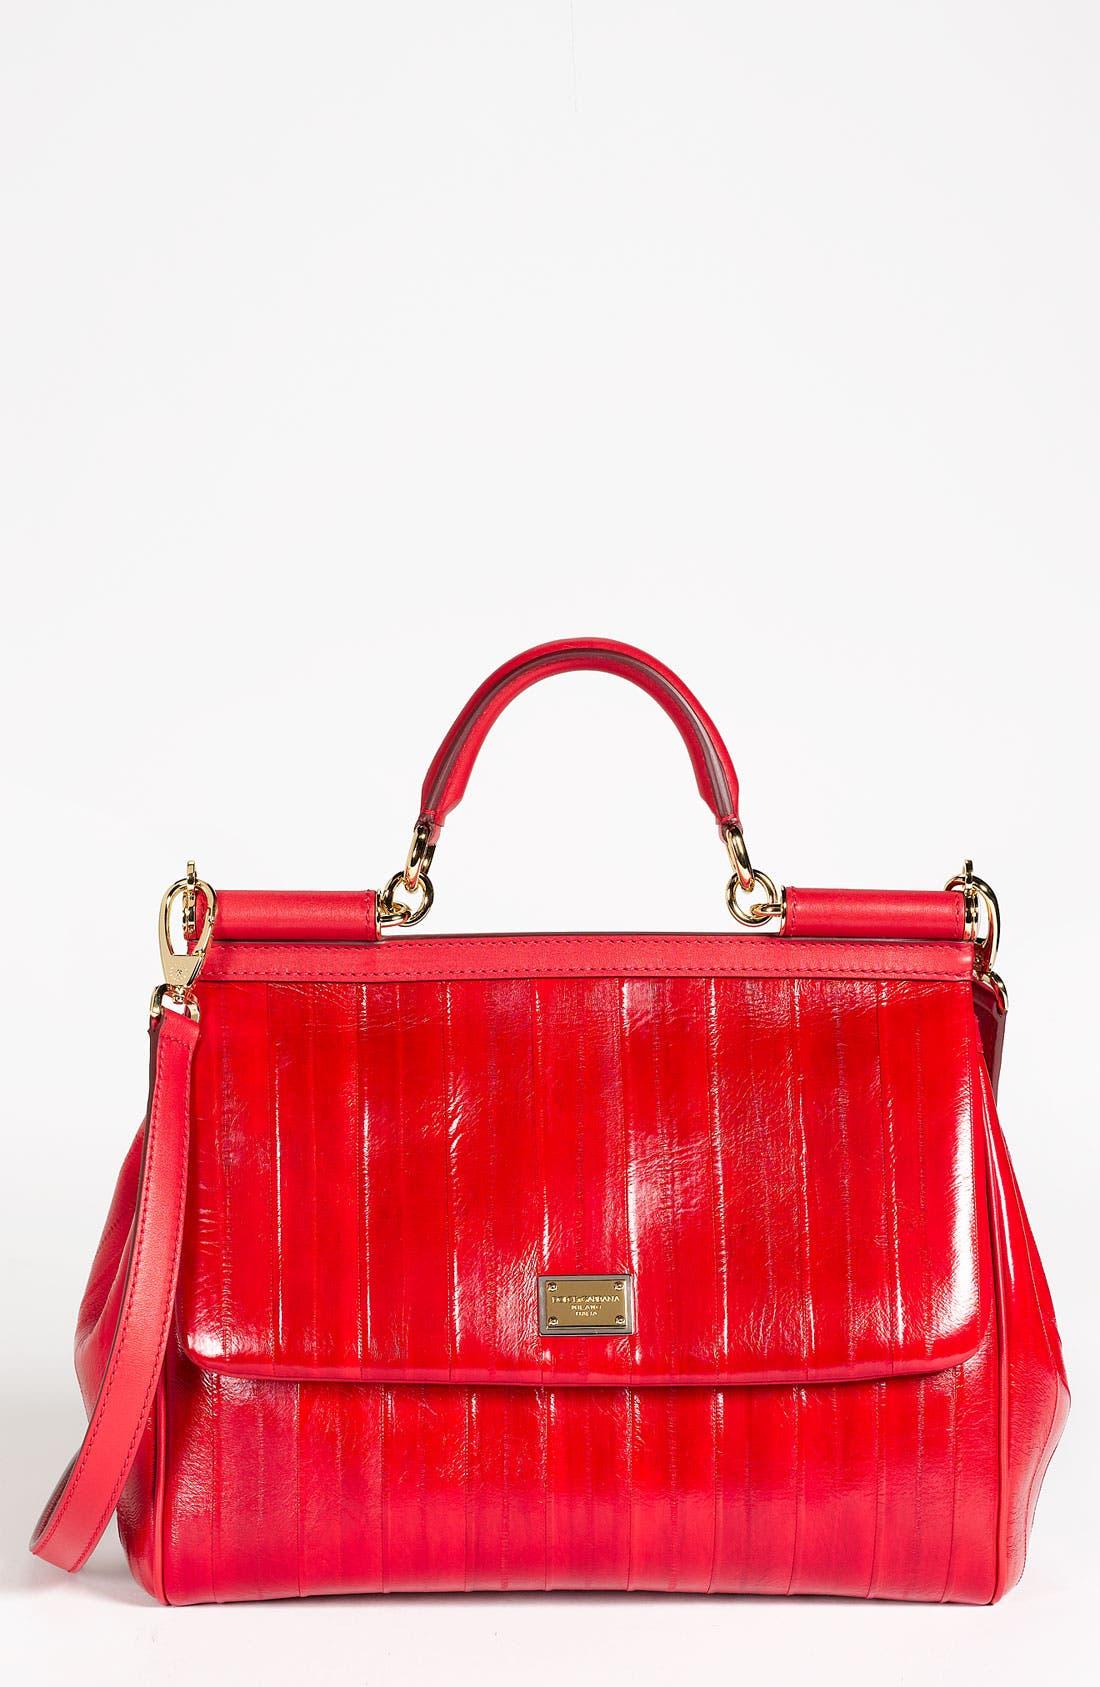 Alternate Image 1 Selected - Dolce&Gabbana 'Miss Sicily' Eel & Leather Satchel